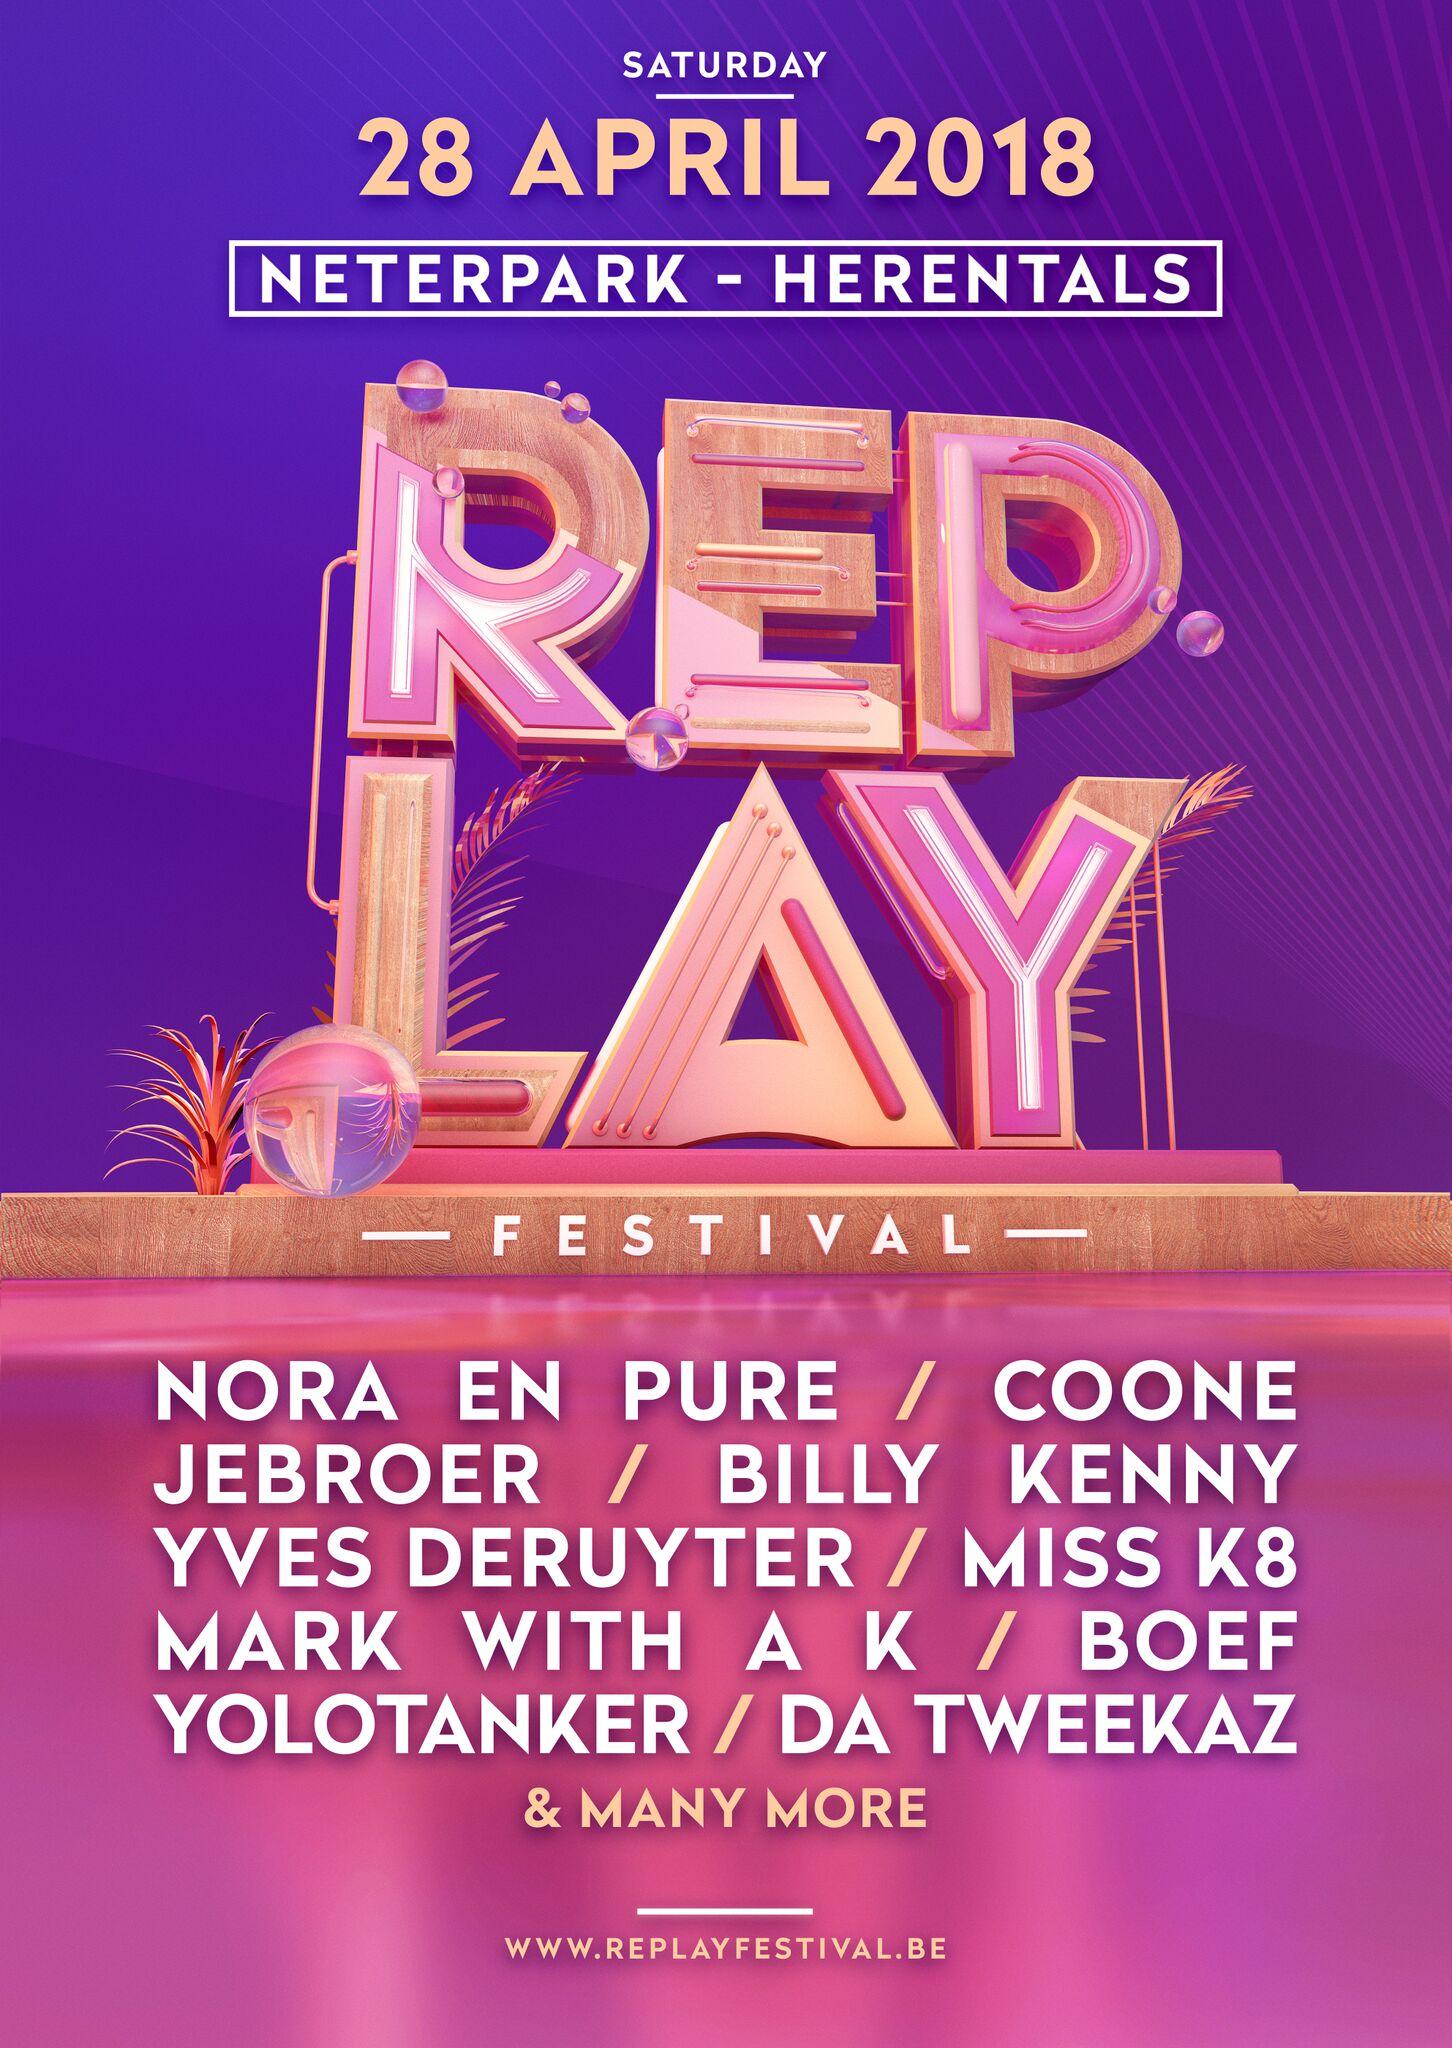 Afterwork Festival en Replay Festival openen dit weekend het nieuwe festivalseizoen! - Boef 2 Affiche